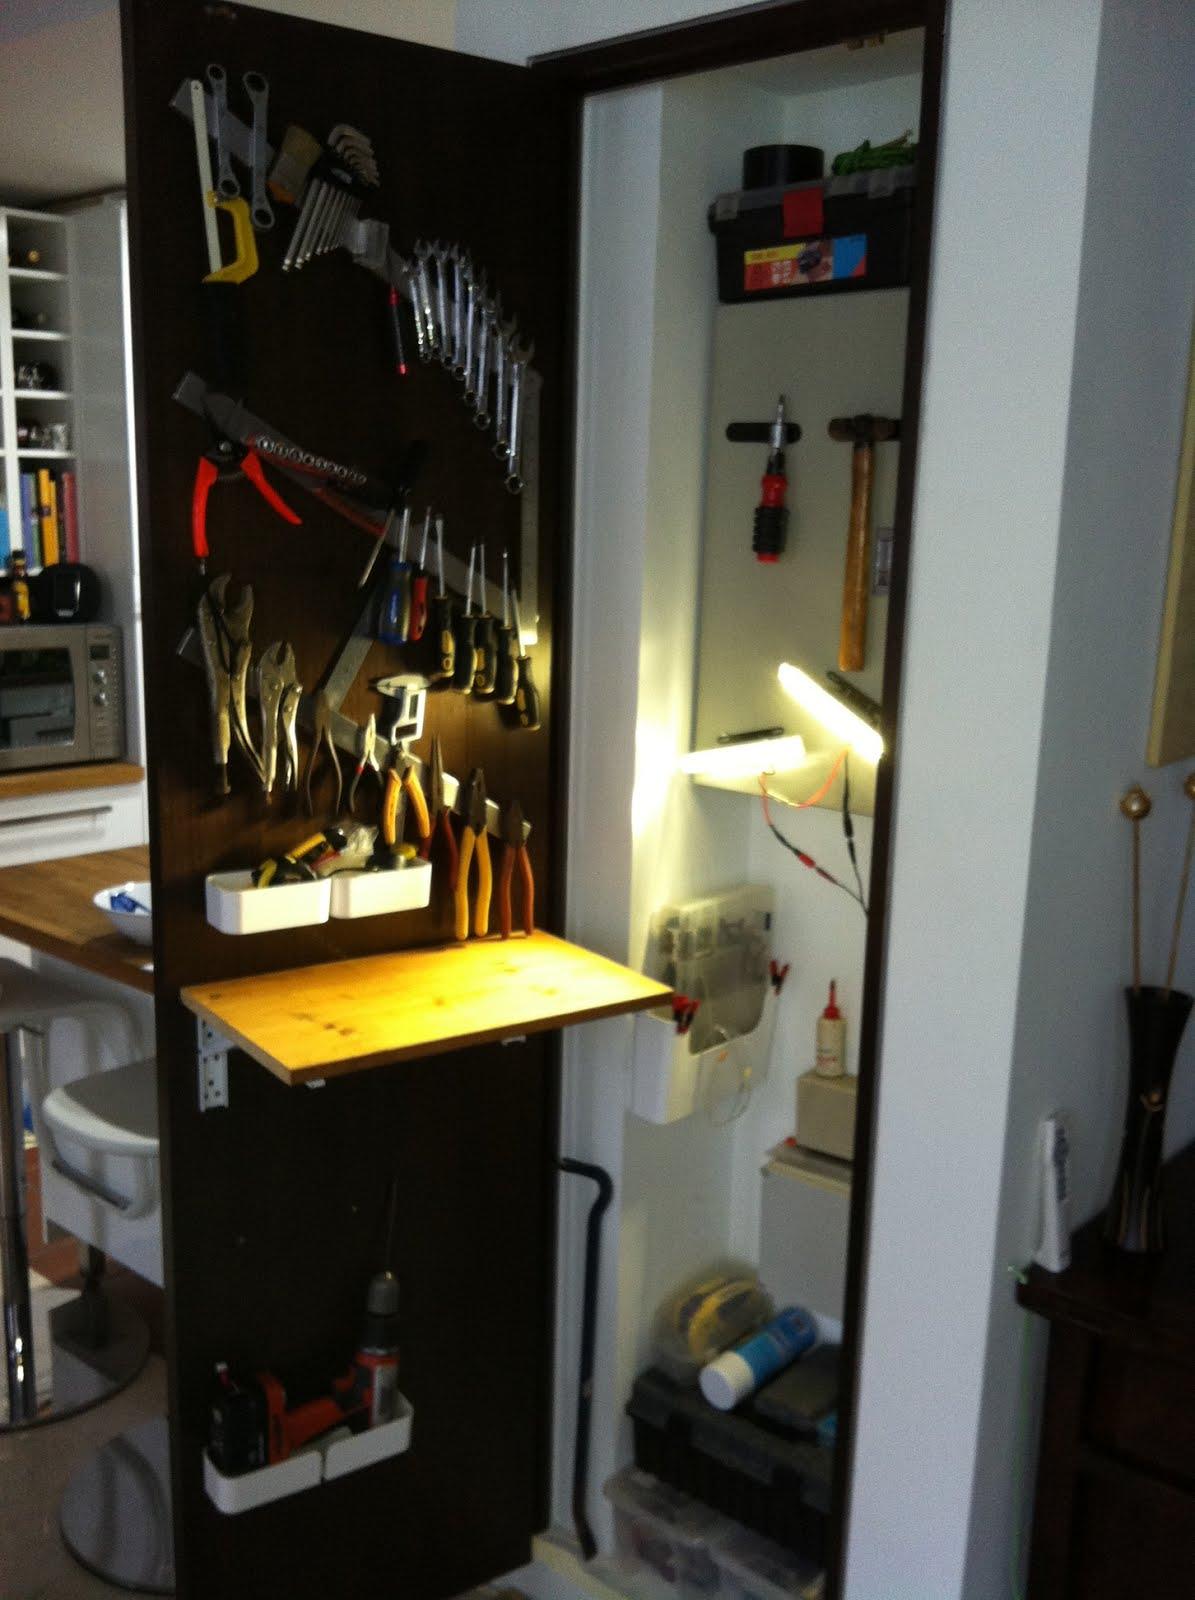 Closet Toolshed Ikea Hackers